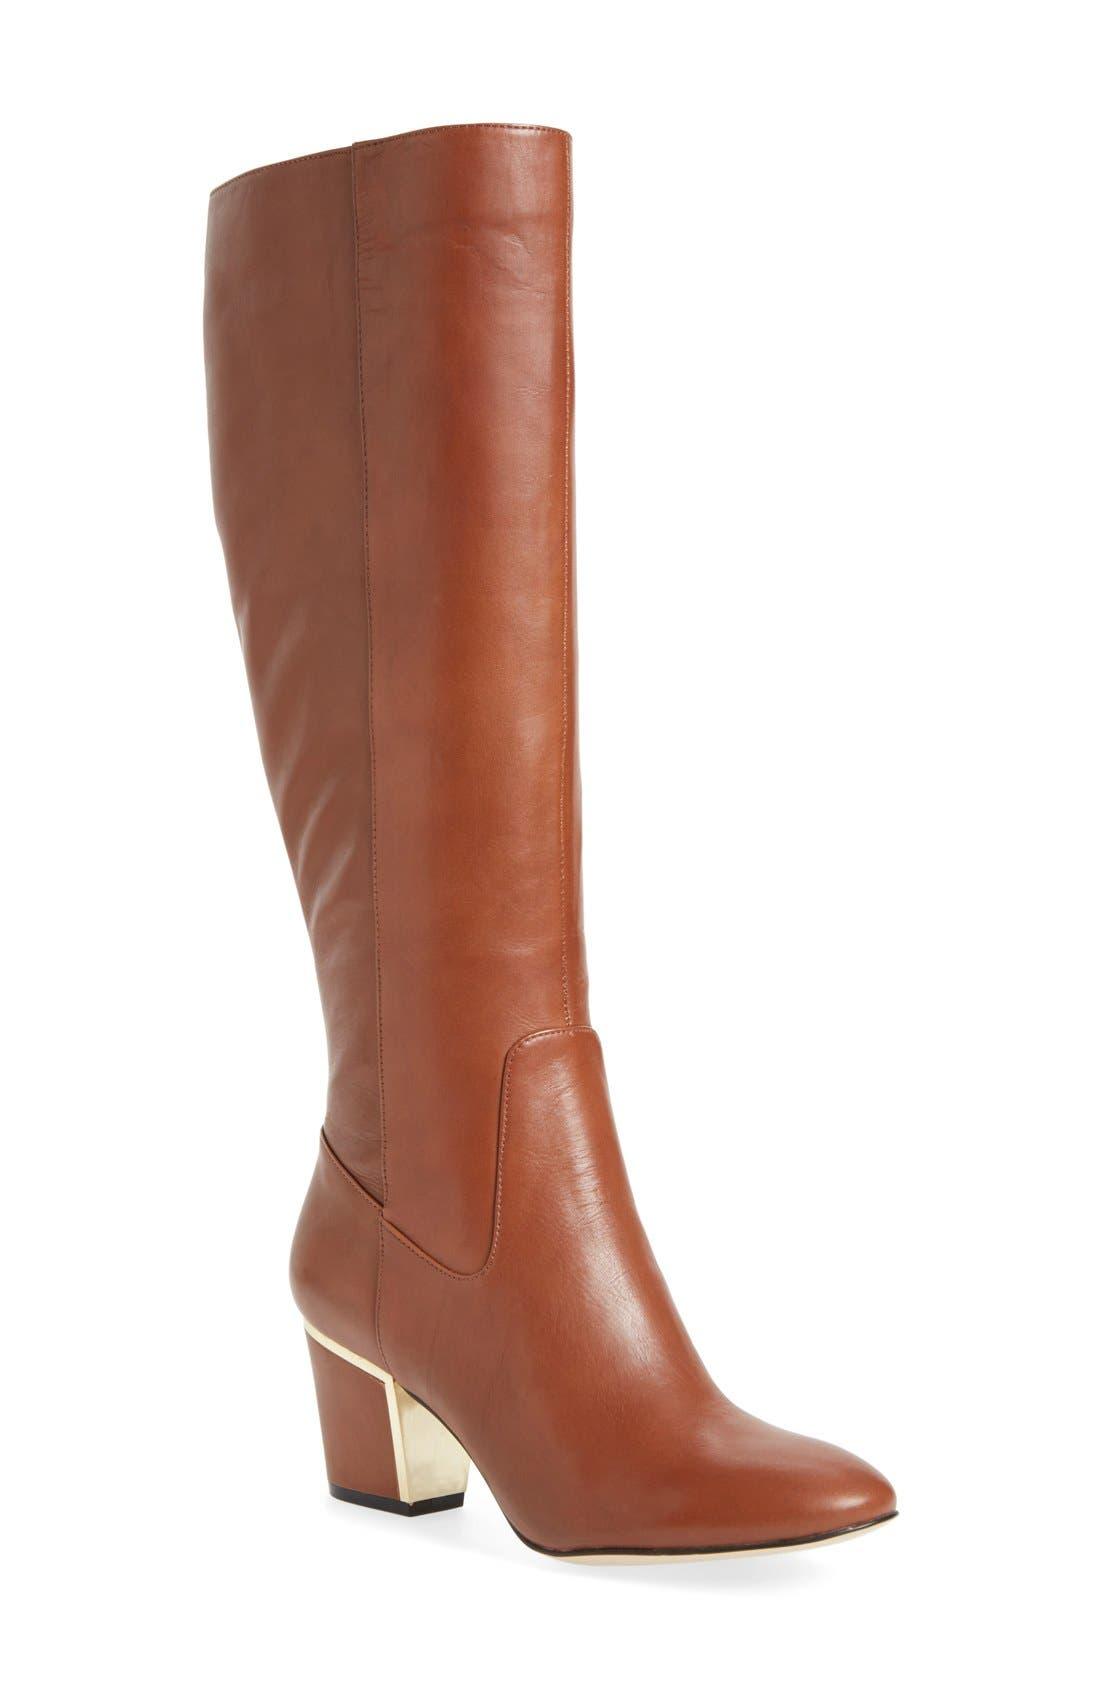 Main Image - Calvin Klein'Keana' Knee High Boot (Women)